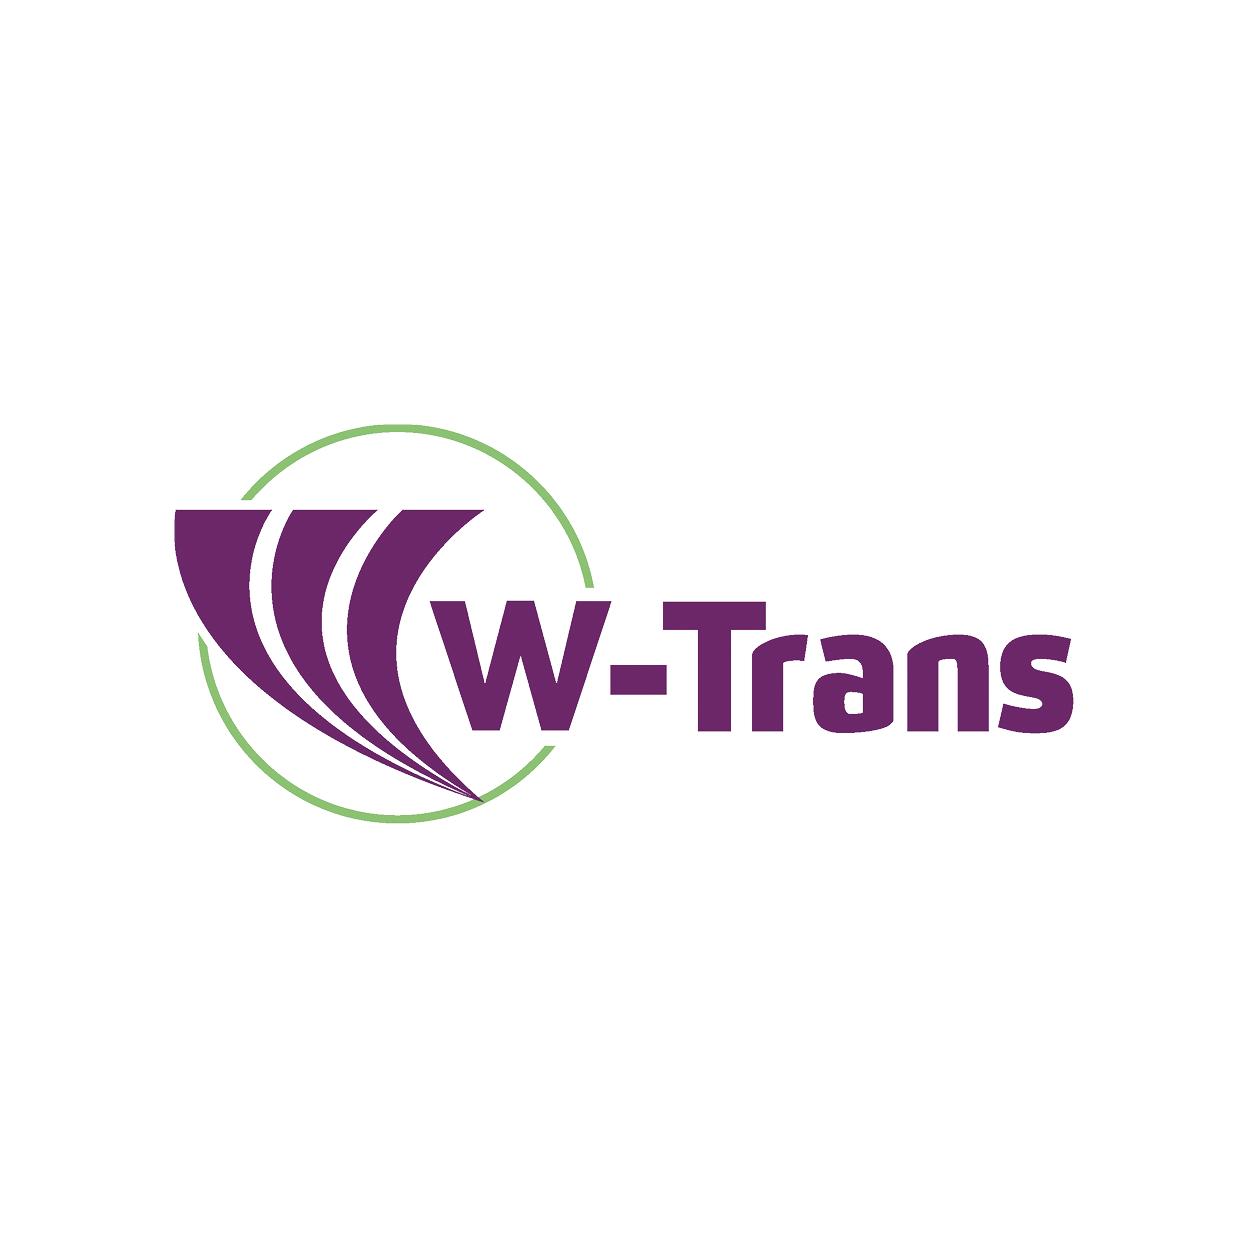 W-Trans